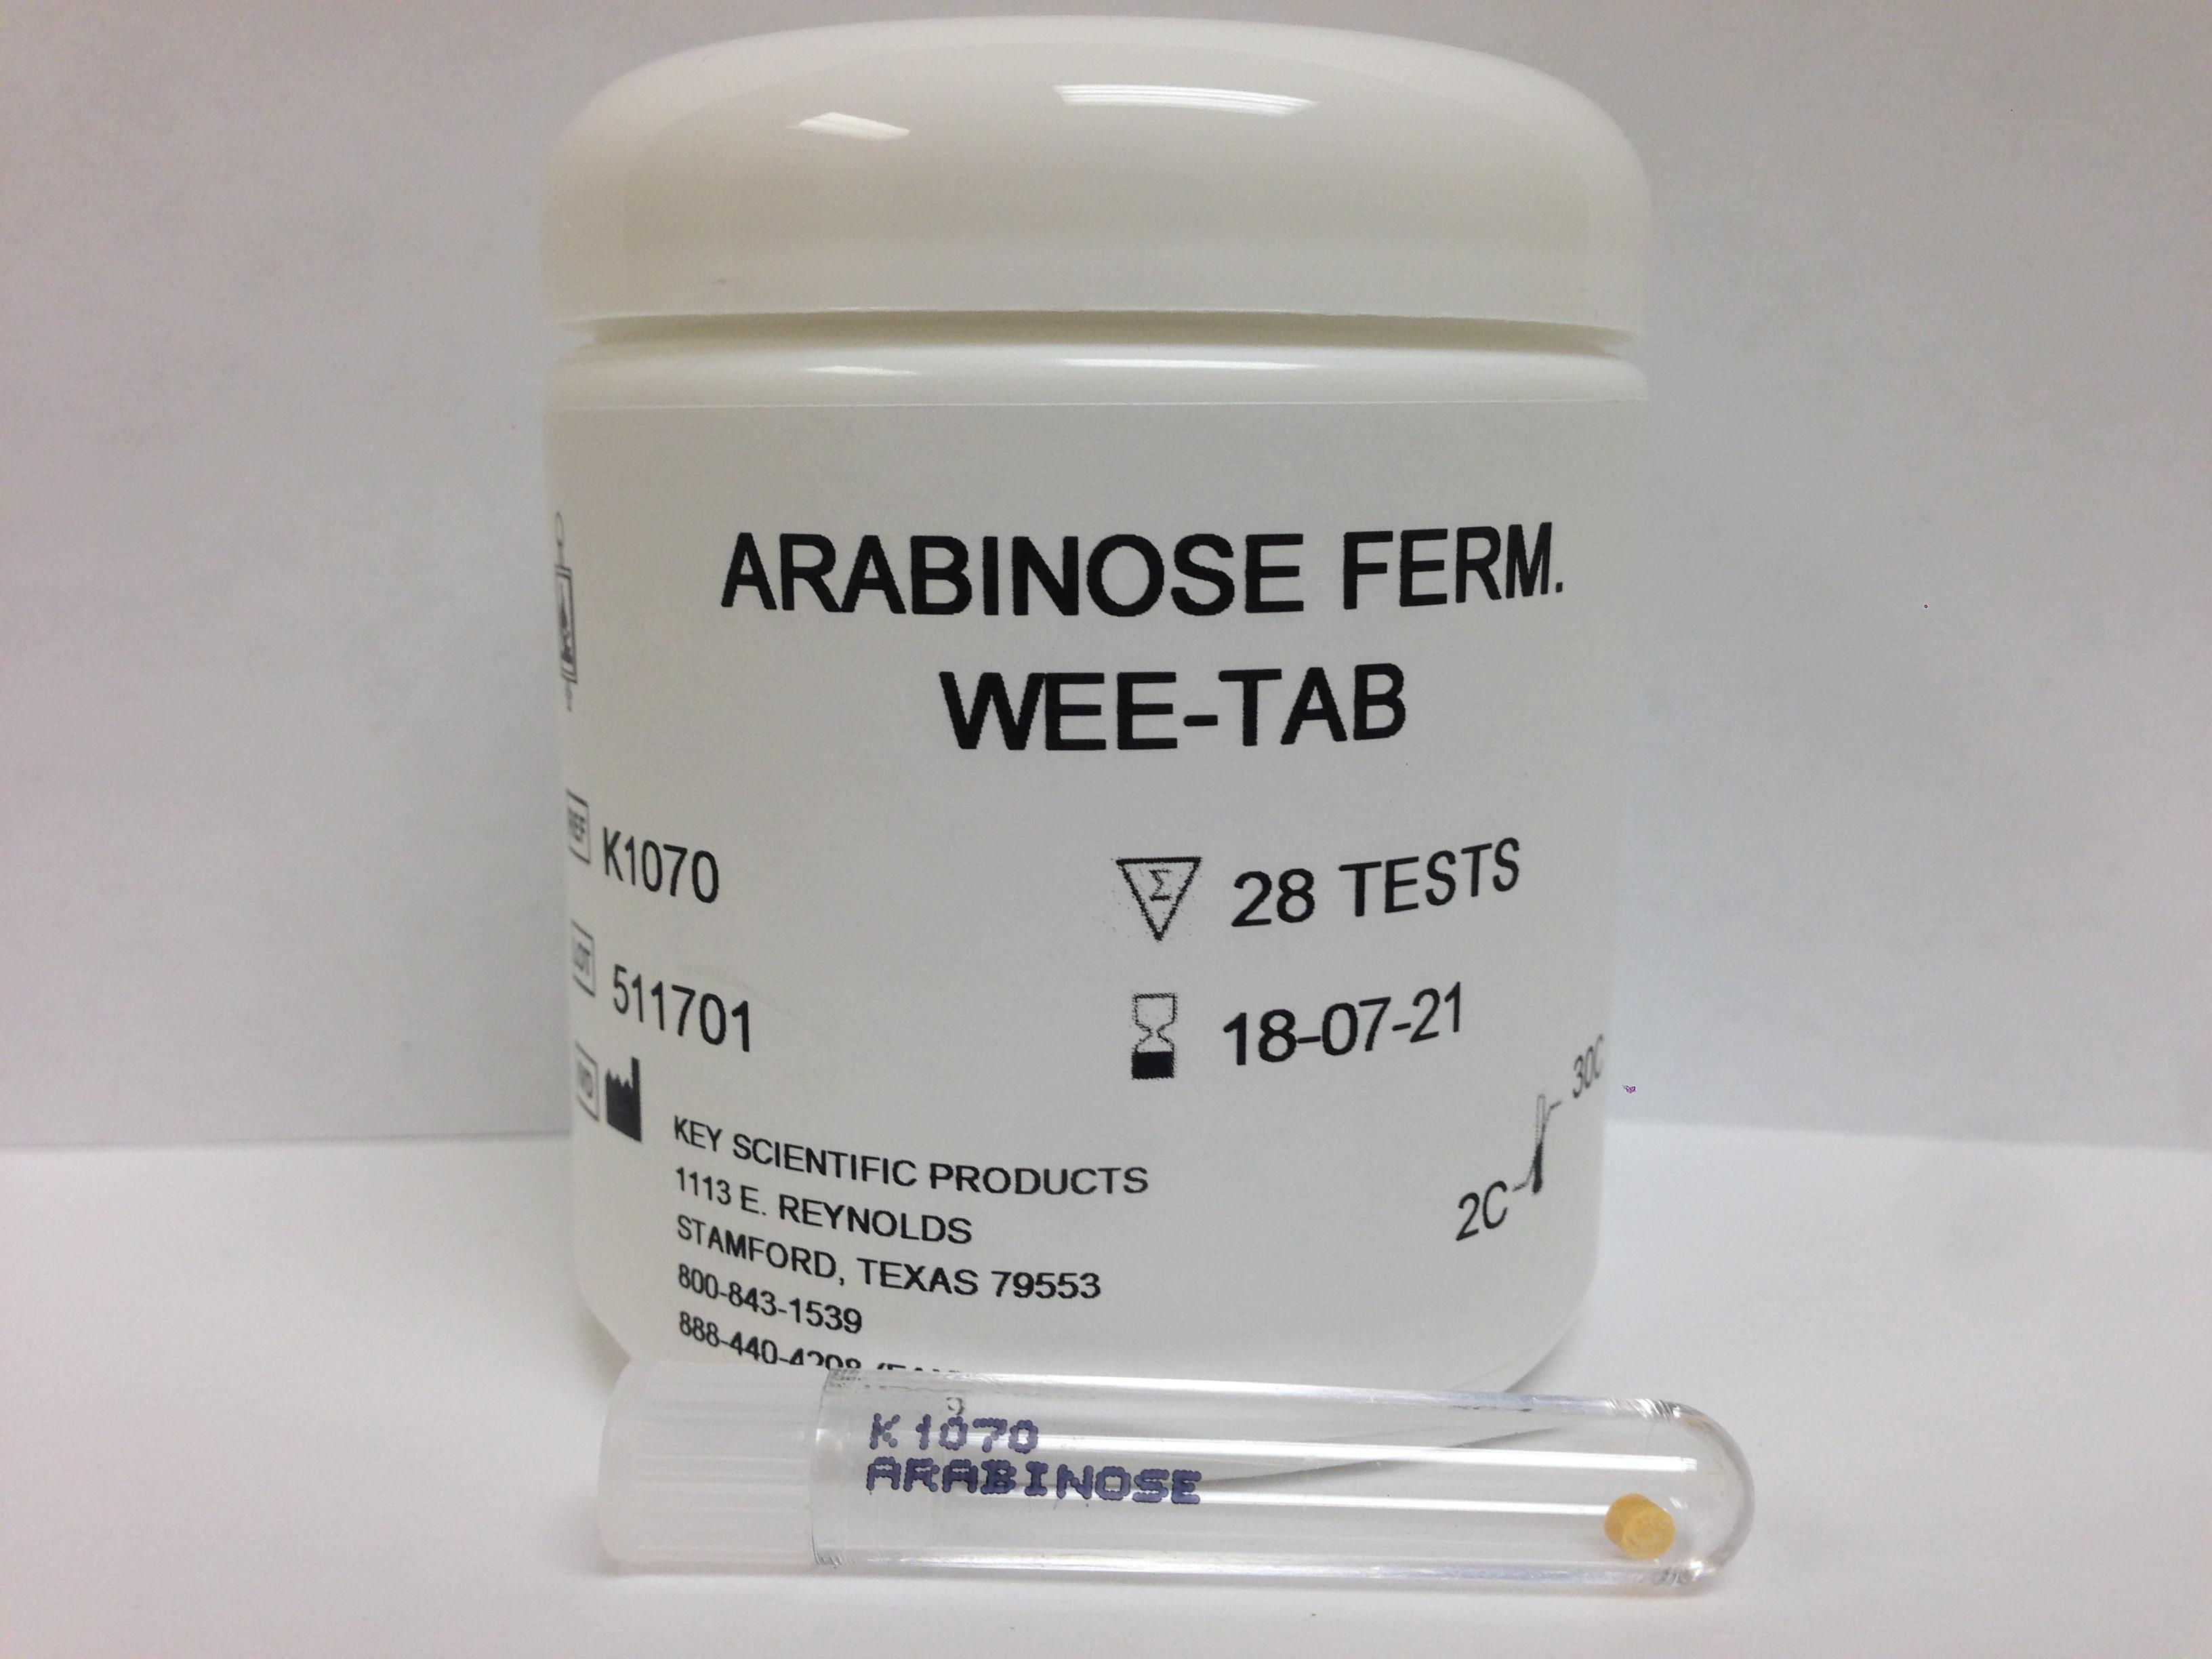 WEE-TAB ARABINOSE FERMENTATION